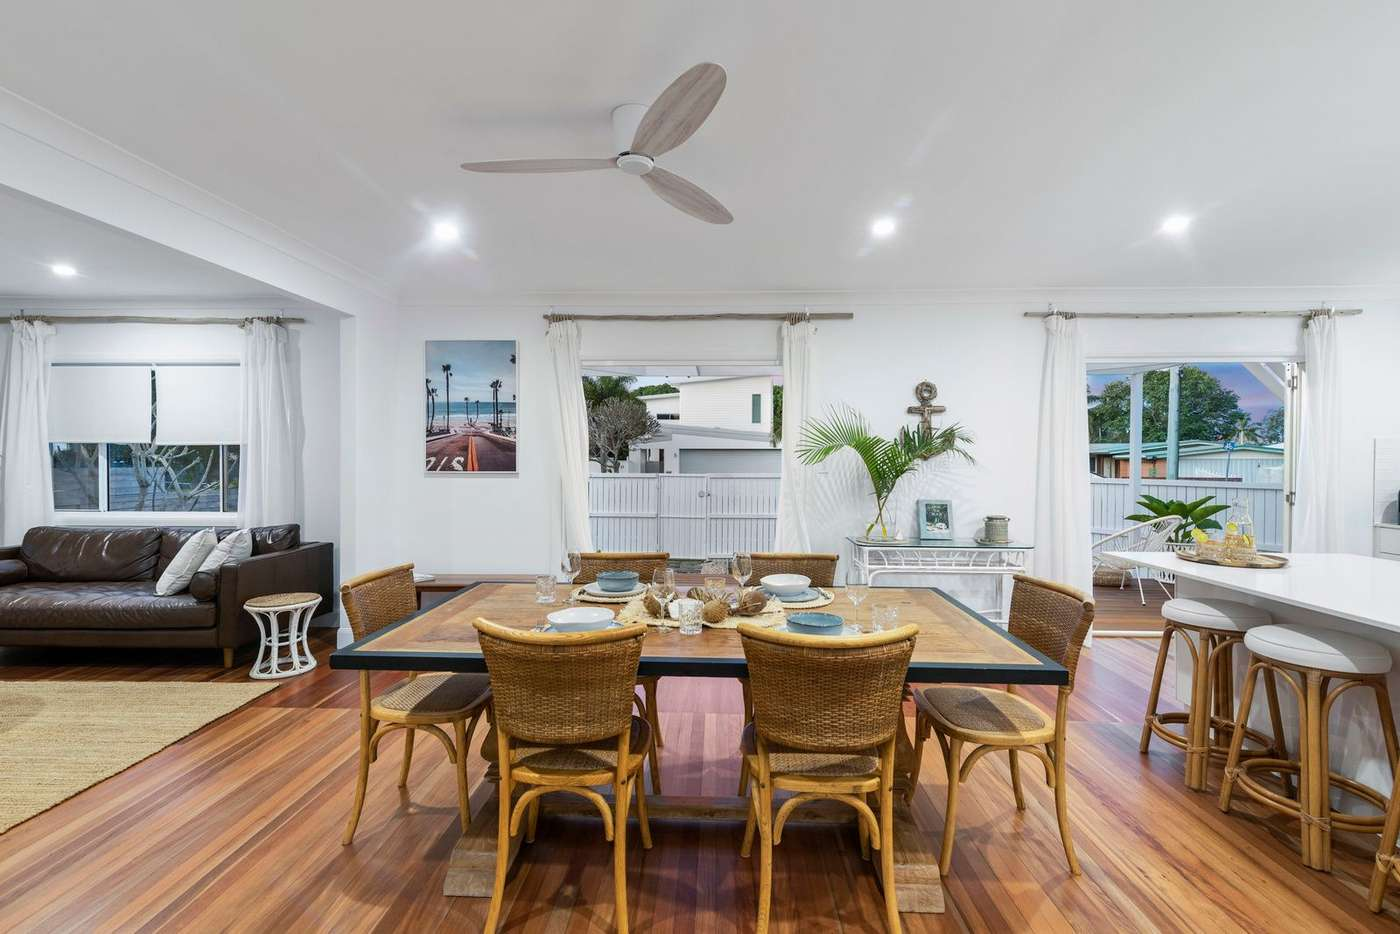 Main view of Homely house listing, 30 Tahiti Avenue, Palm Beach QLD 4221